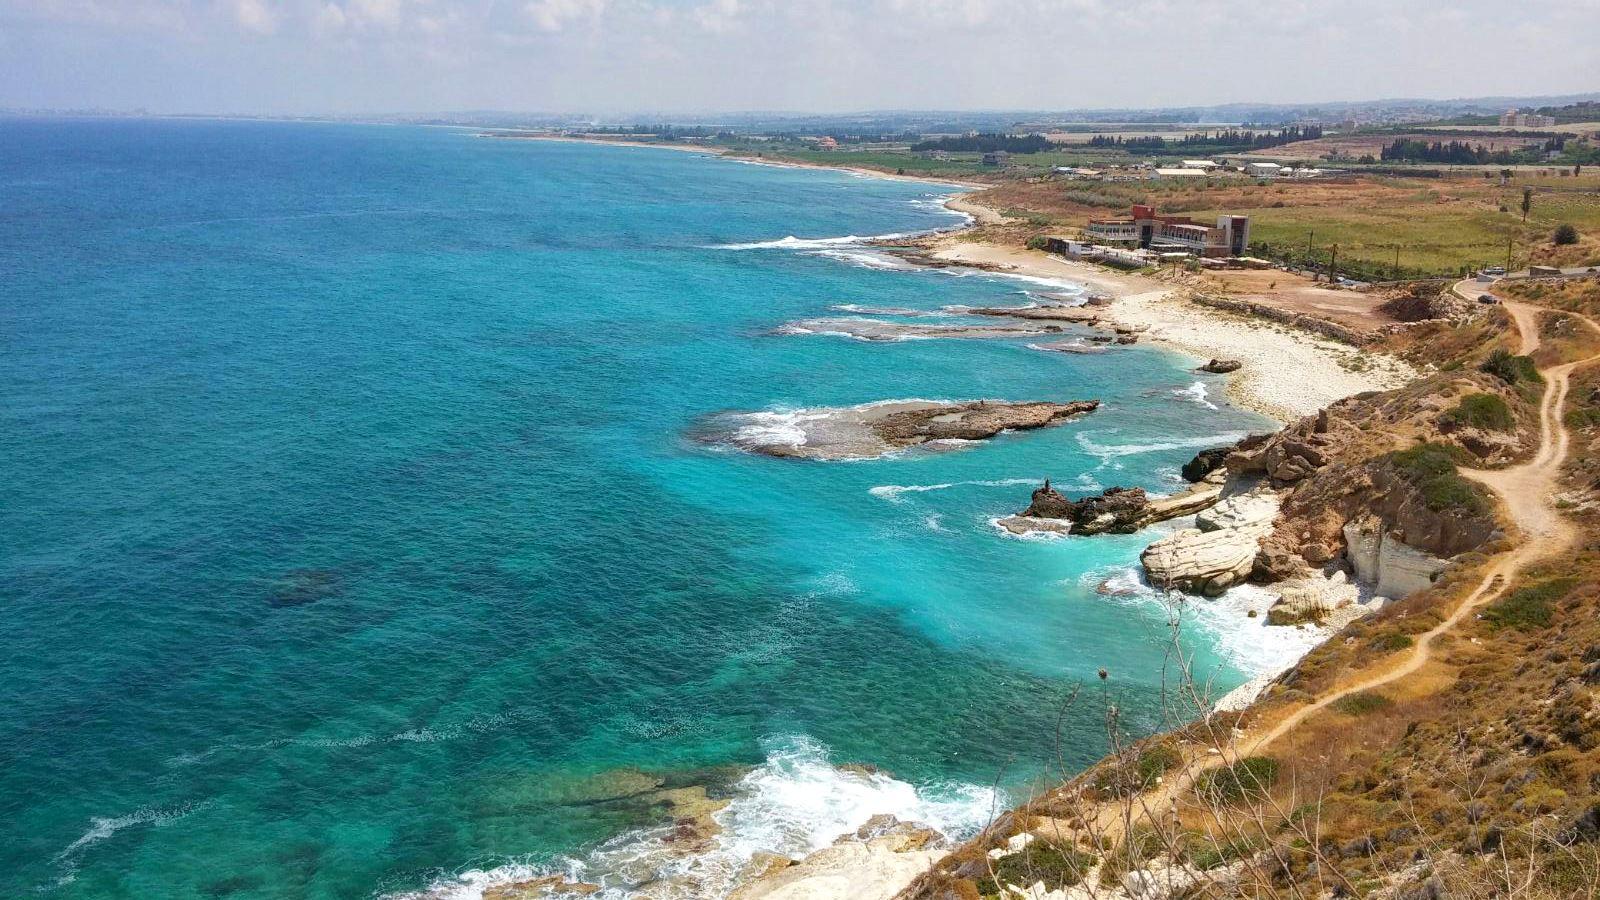 Naqoura Beach